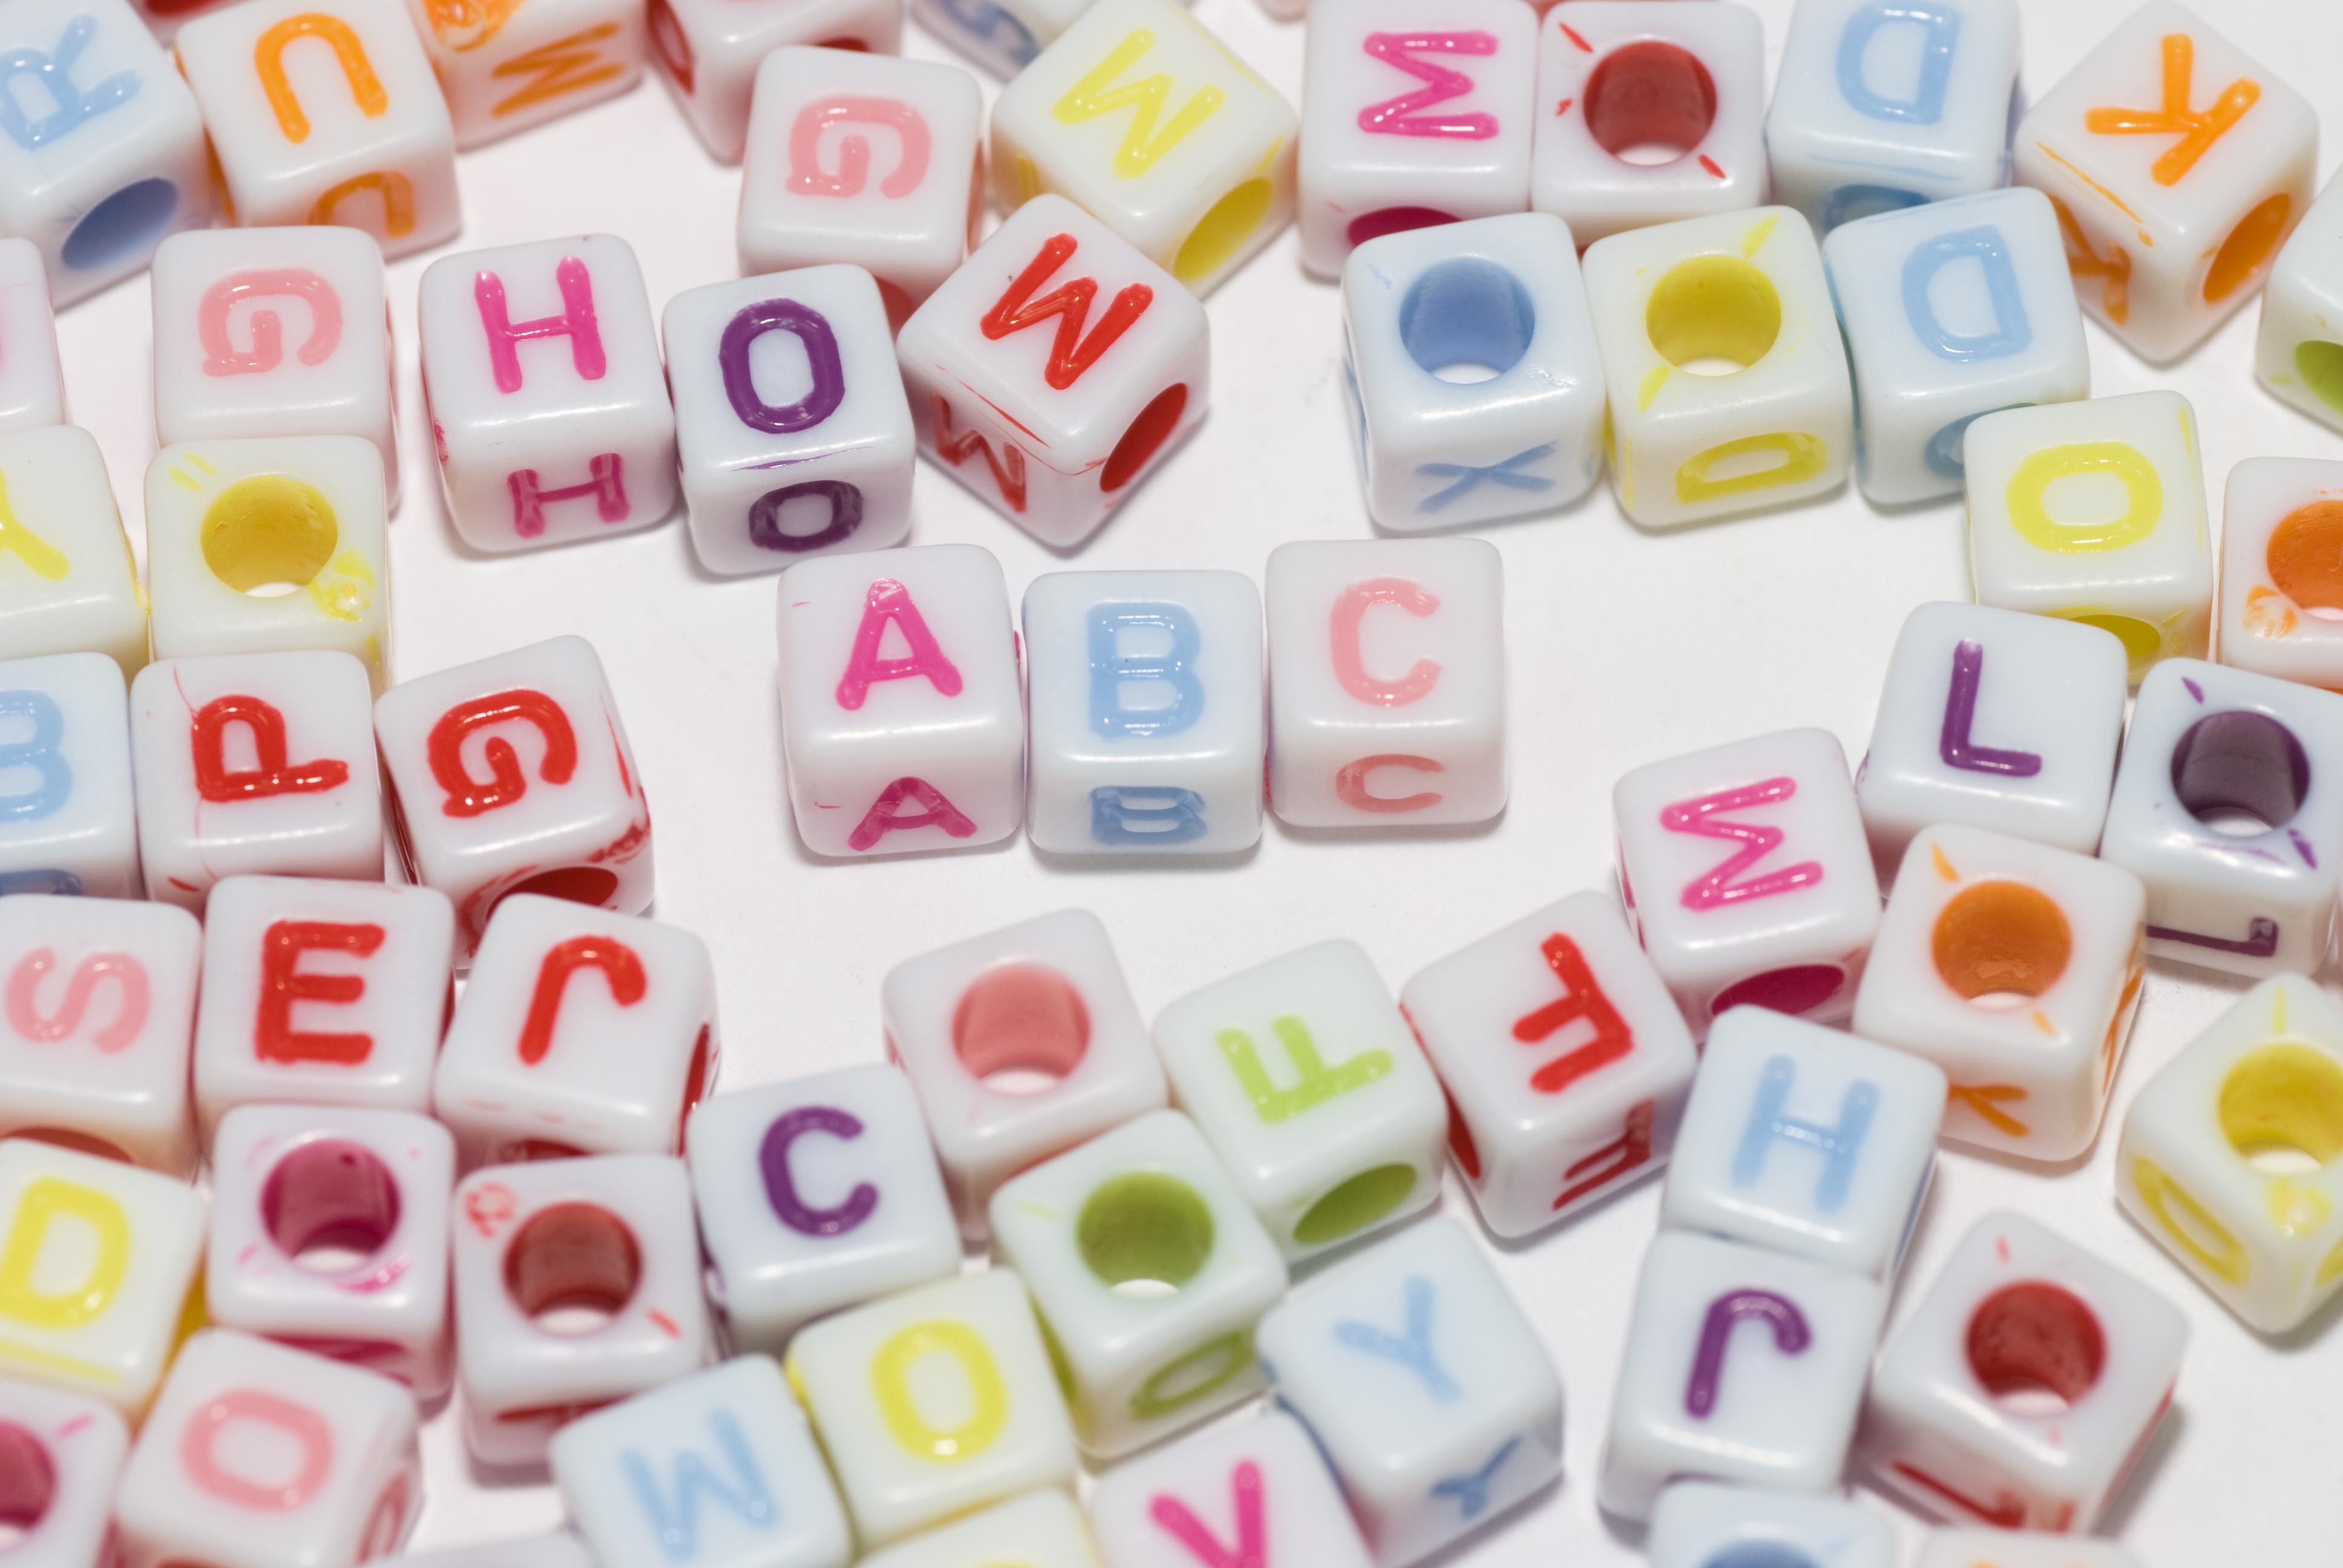 Etymologi, läran om ordets ursprung.